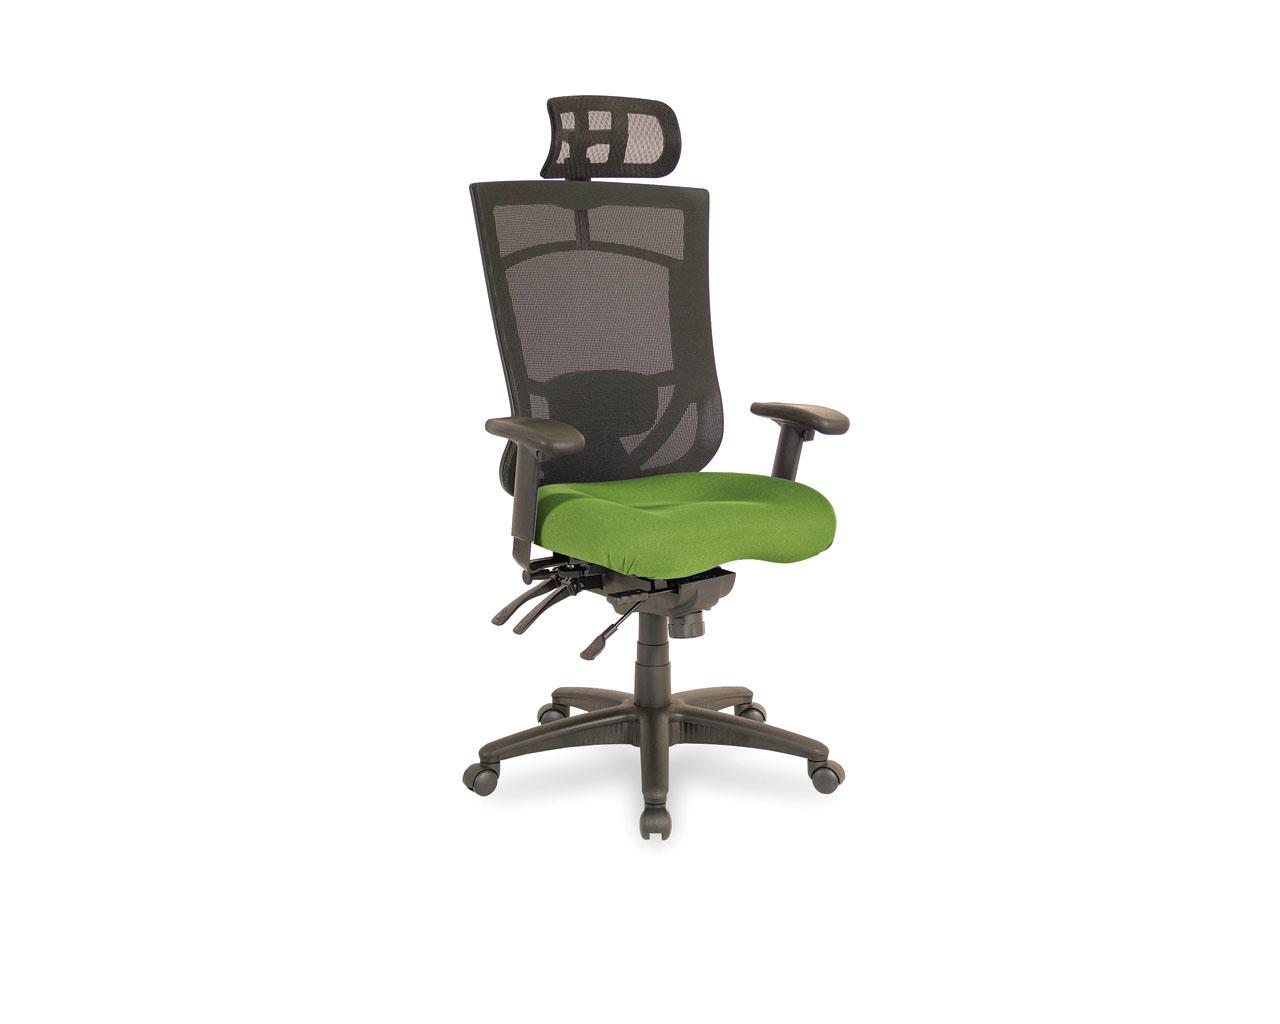 katja gy dania back chair furniture grey products high